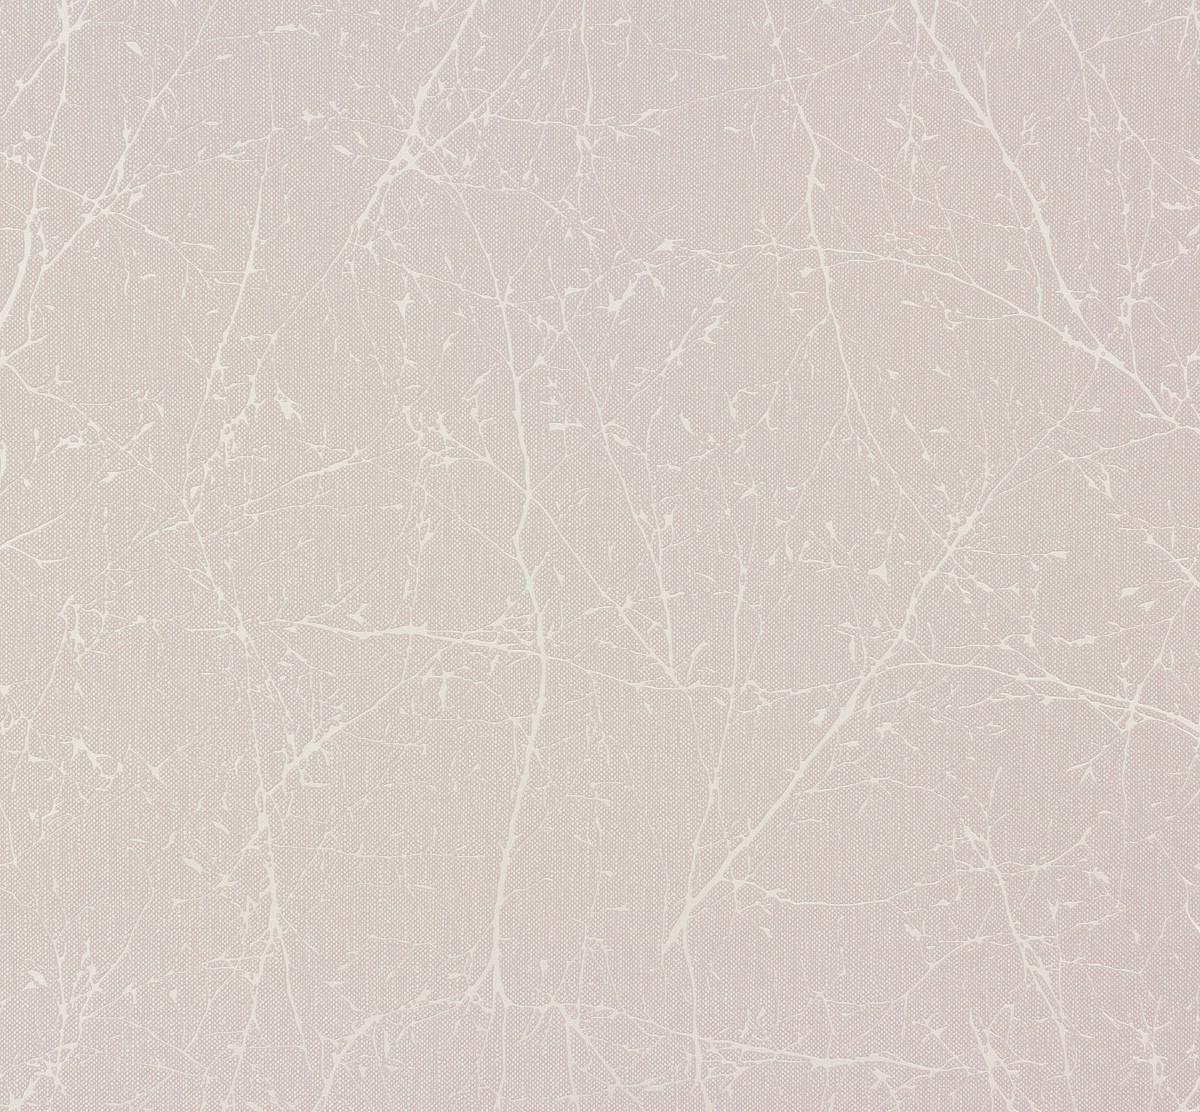 tapete natur grau wei as creation elegance 30507 1. Black Bedroom Furniture Sets. Home Design Ideas